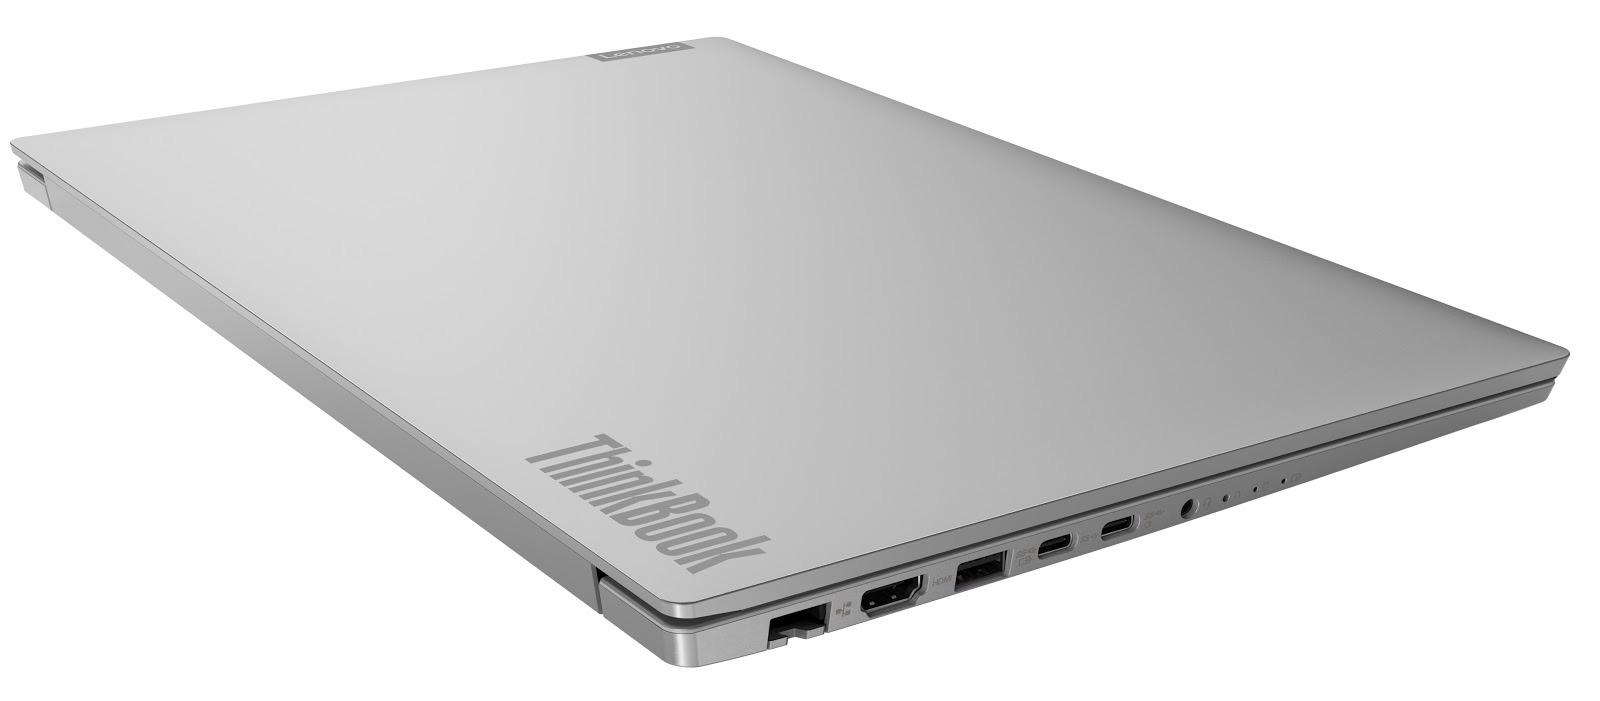 Фото 3. Ноутбук Lenovo ThinkBook 15-IIL (20SM003XRU)